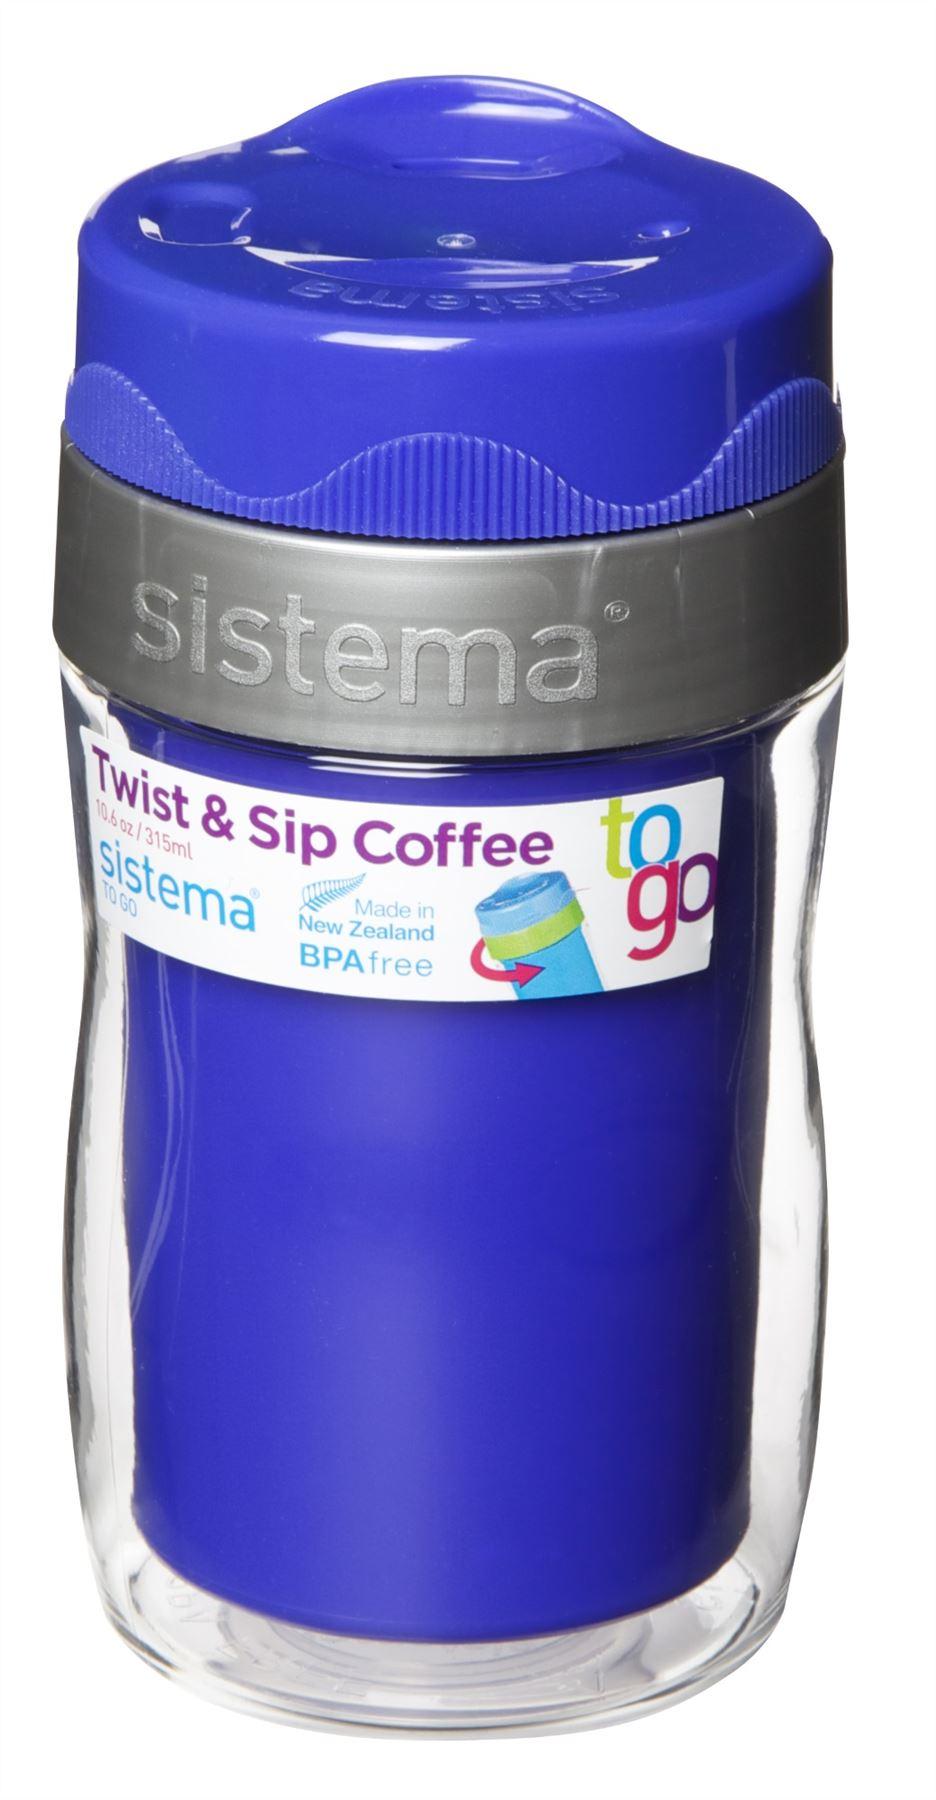 sistema twist 39 n 39 sip coffee to go travel mug thermos 490ml or 315ml all colours ebay. Black Bedroom Furniture Sets. Home Design Ideas